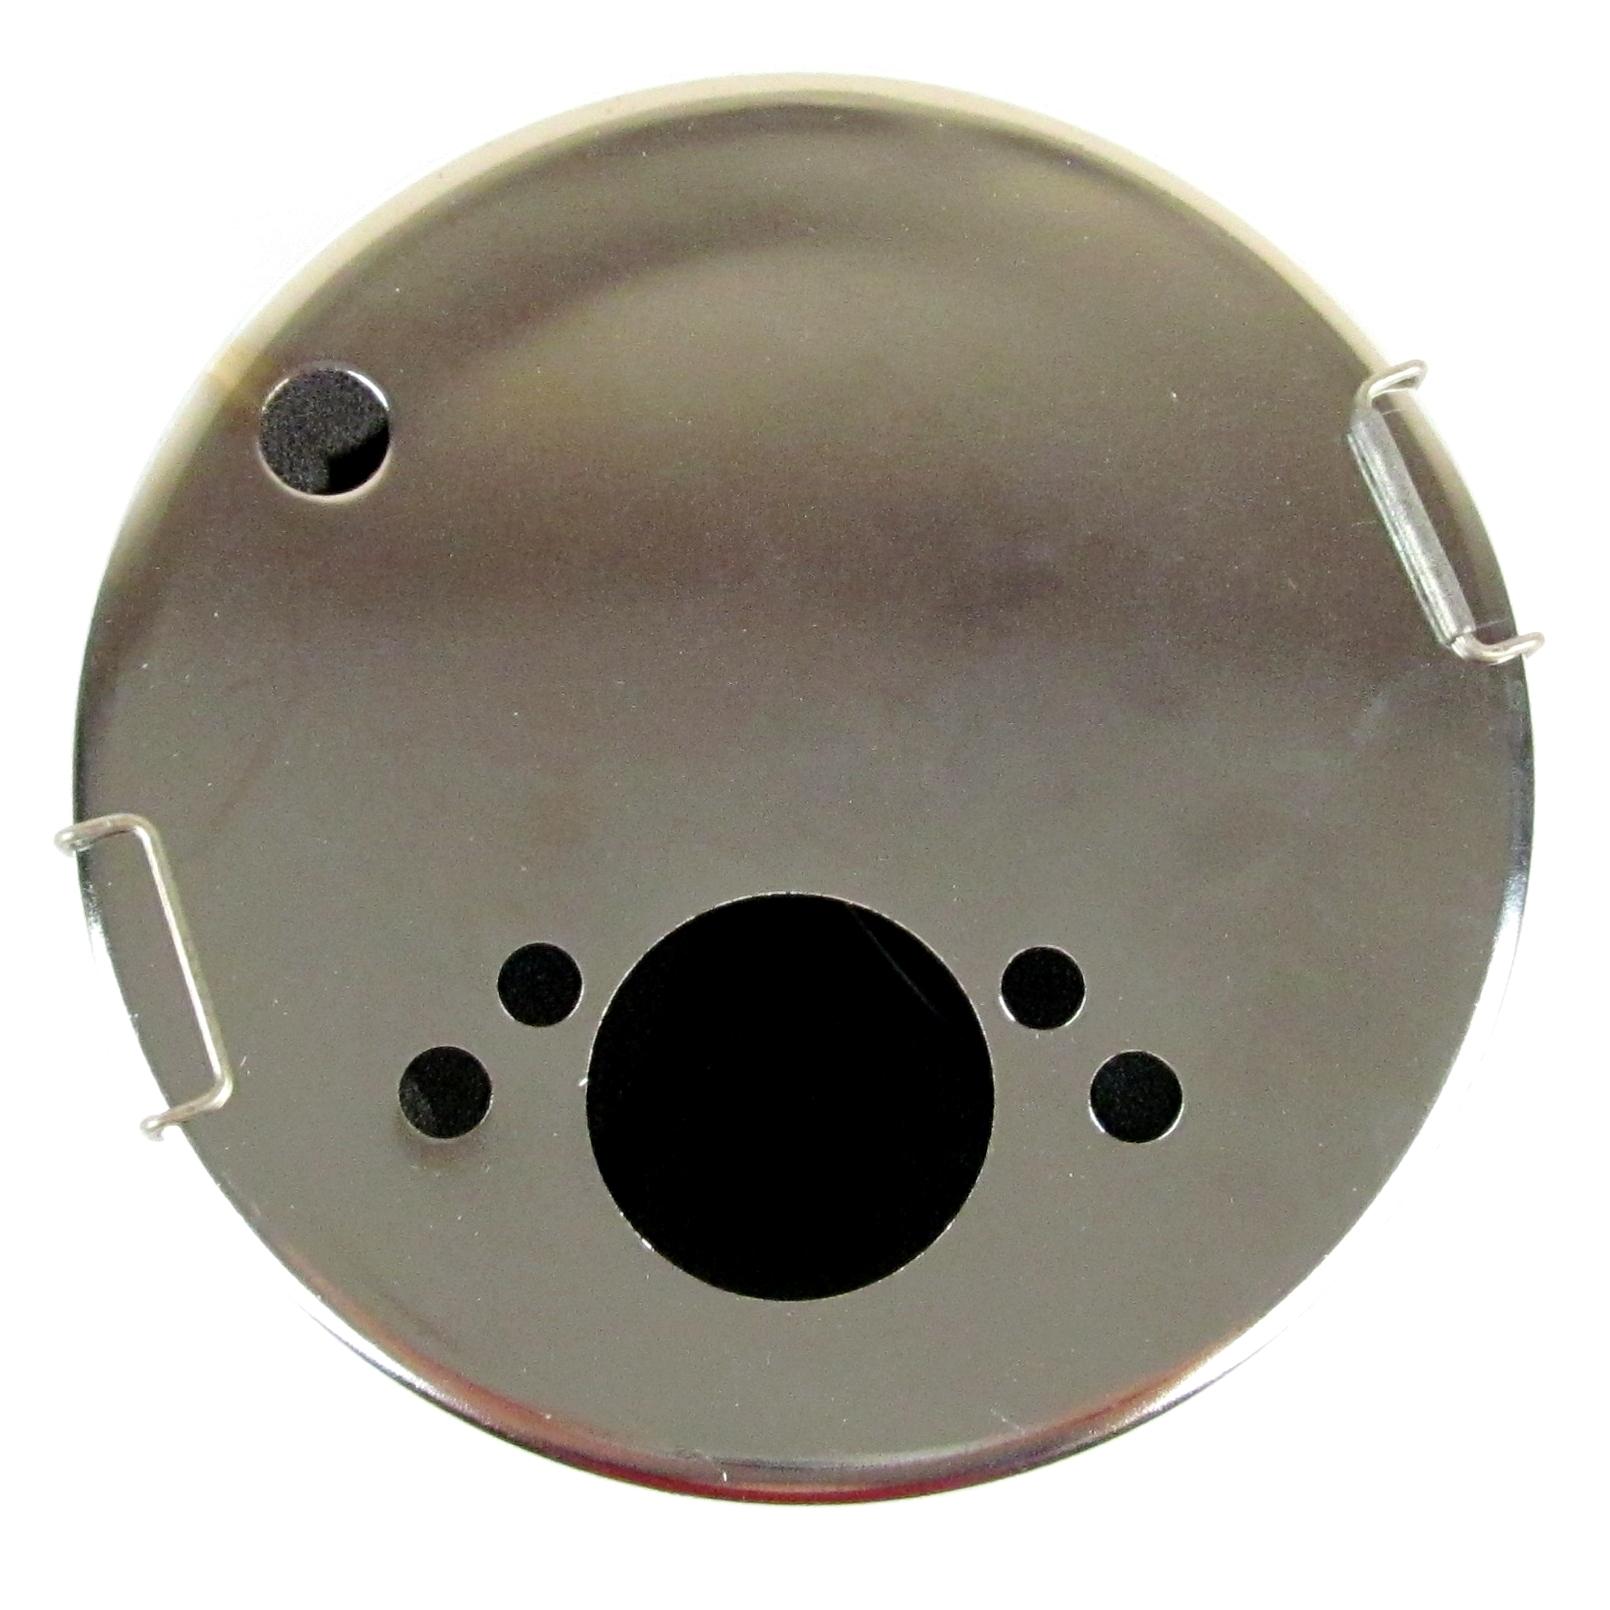 "LYNX RAMFLO AIR FILTER FOR SU HS4 & HIF4 1-½ ""CARB / CARBURETTOR"